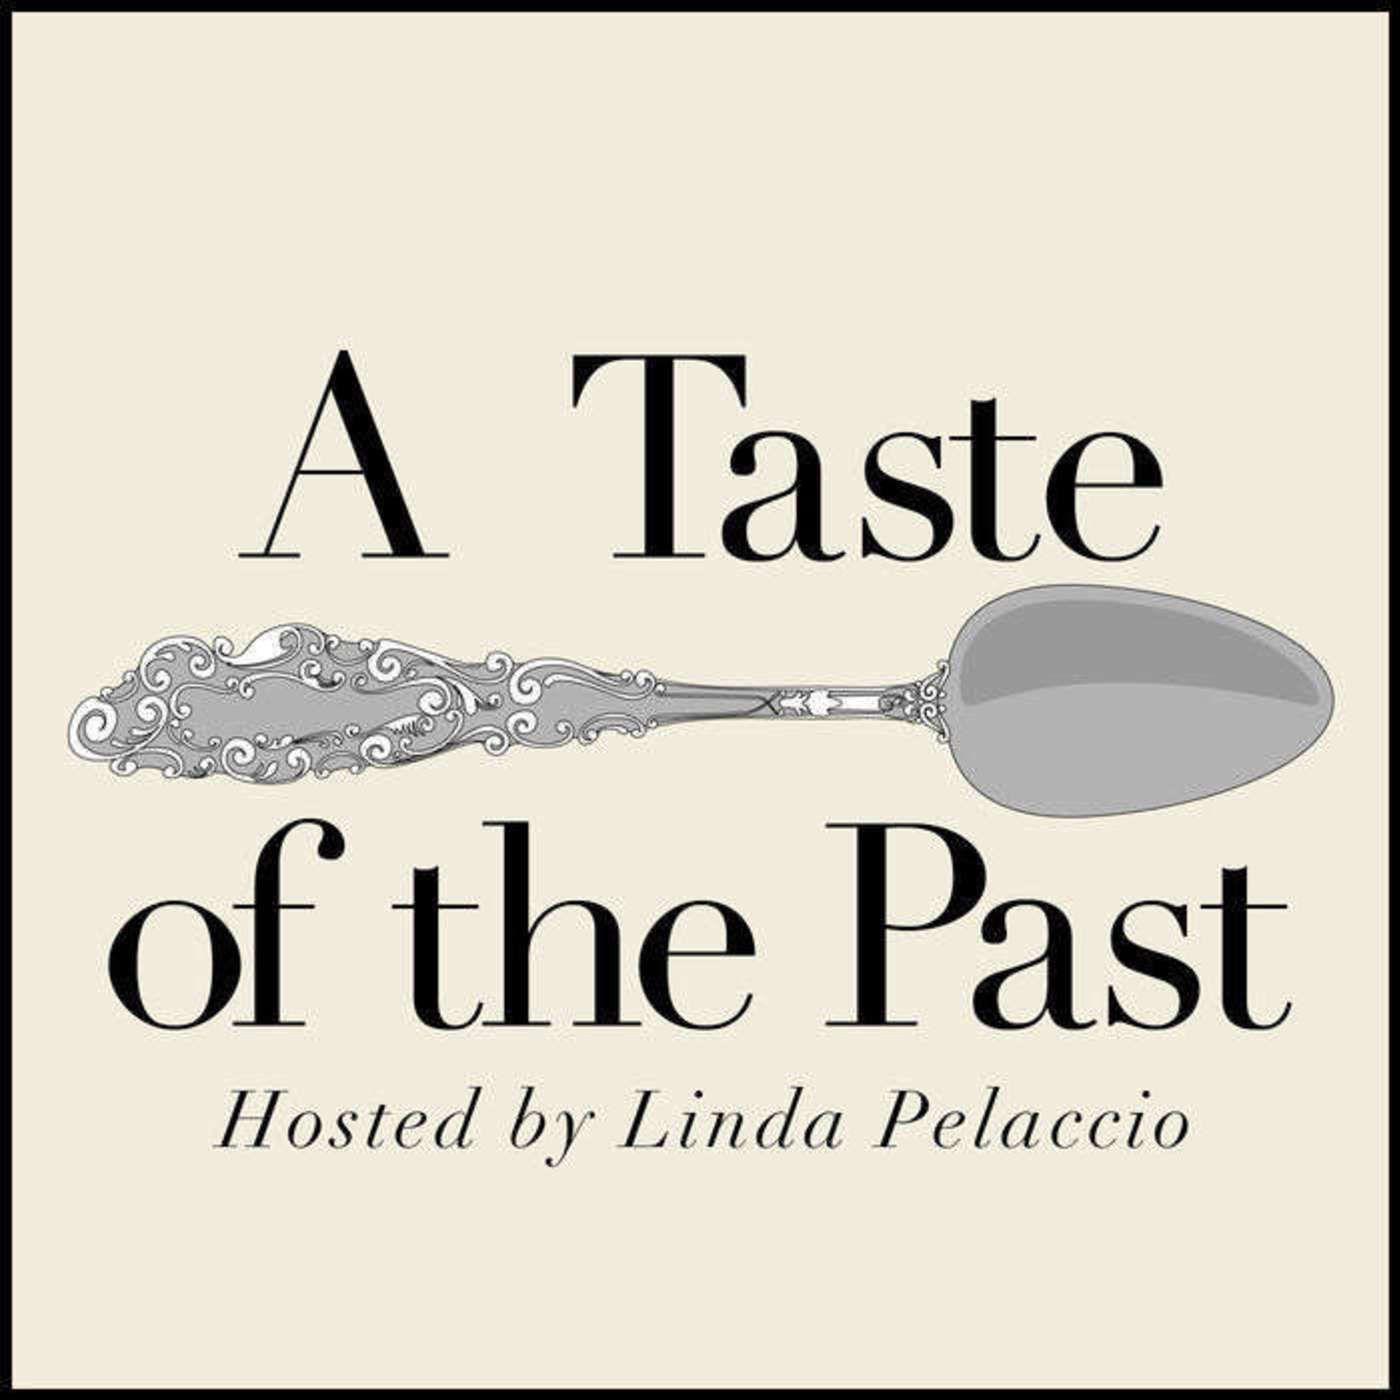 Episode 150: Cuisine & Empire with Rachel Laudan